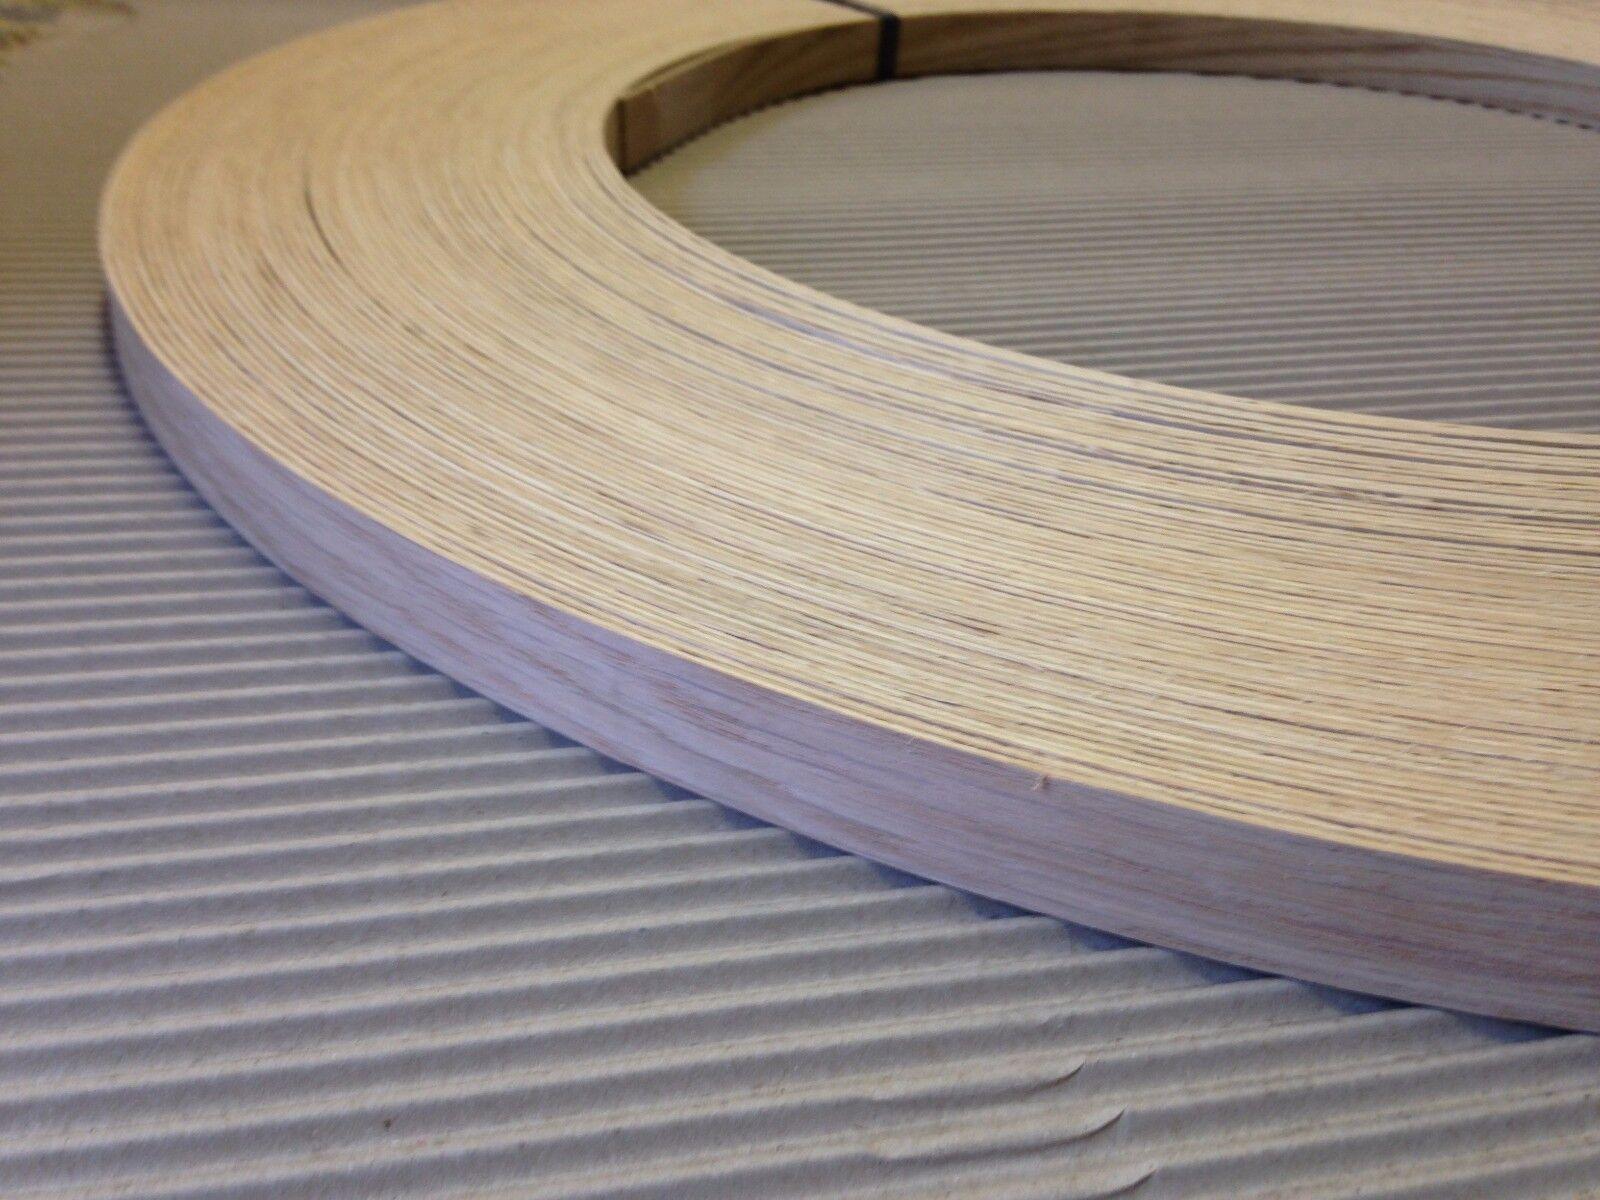 American White Oak Unglued Wood Veneer Edging 1mm Thick x22mm x 100m